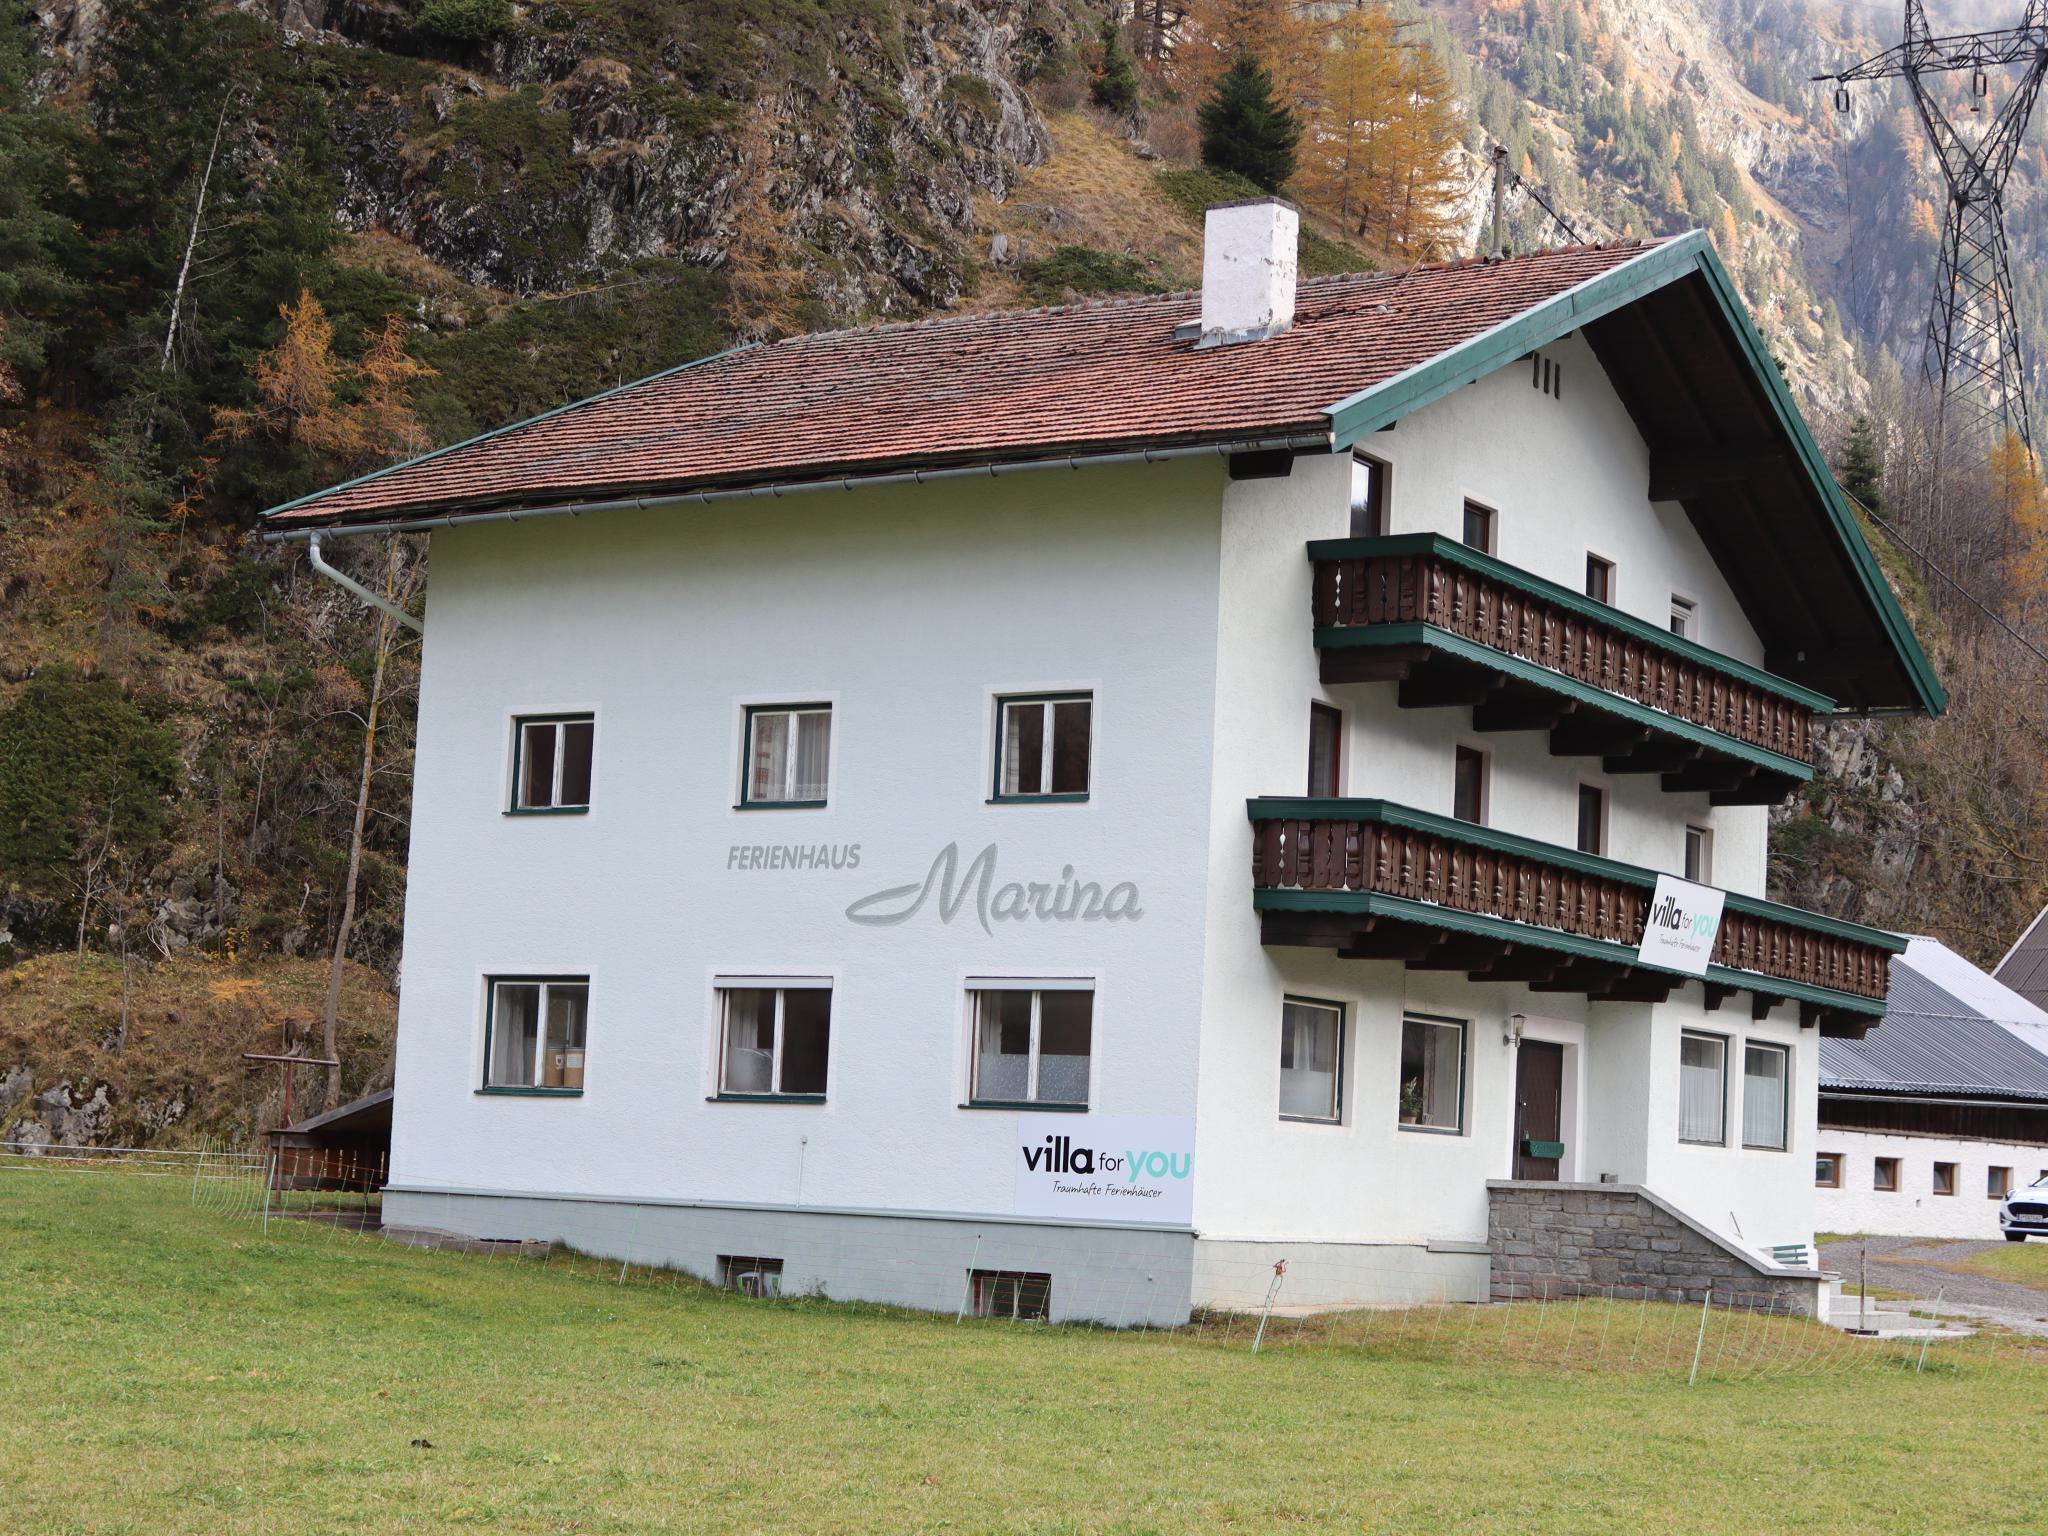 Ferienhaus Marina Tirol